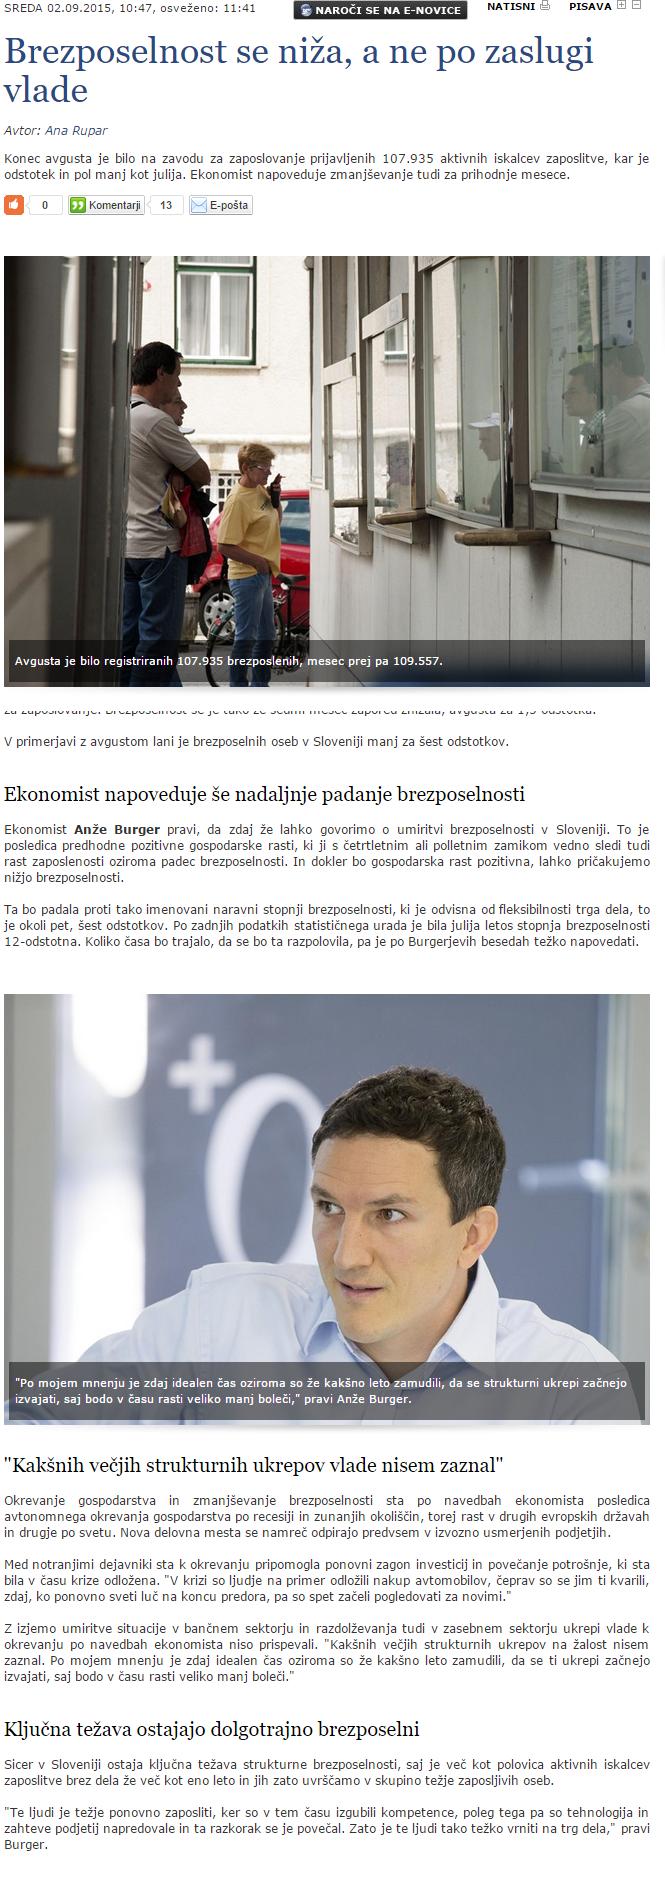 screencapture-www-siol-net-novice-moja_sluzba-novice-2015-09-brezposelnost_avgust-aspx-1443090663274